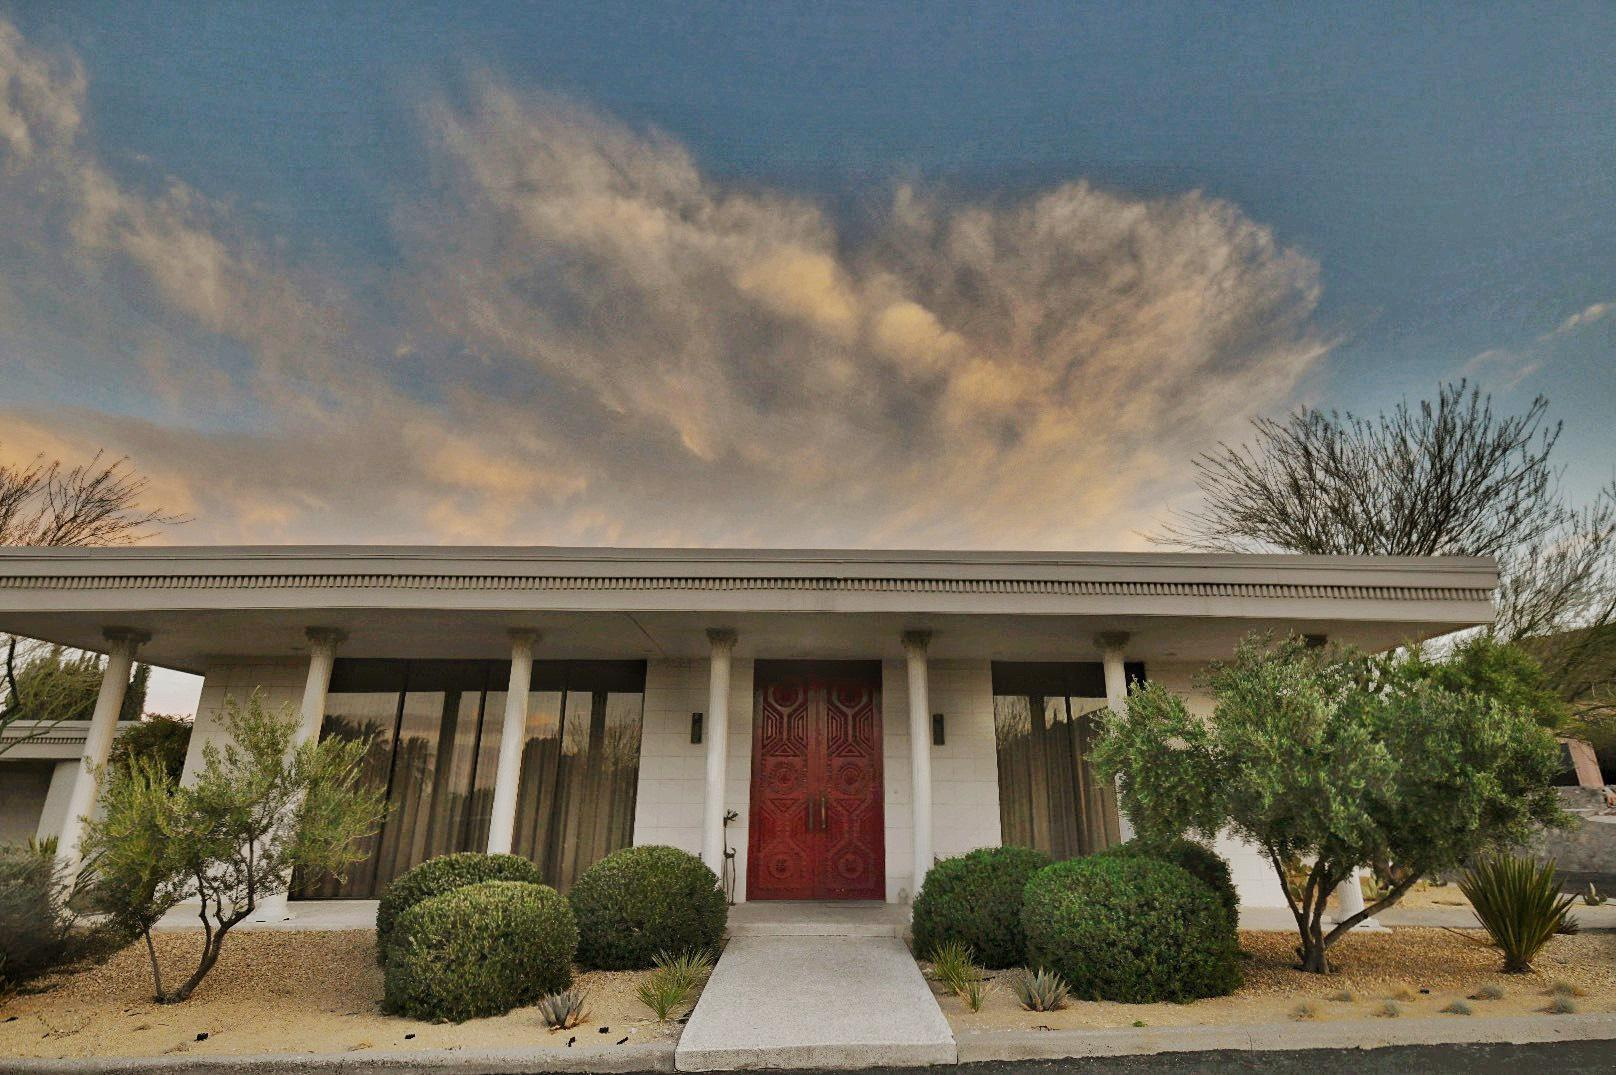 813 TWIN HILLS DRIVE, El Paso, Texas 79912, 5 Bedrooms Bedrooms, ,5 BathroomsBathrooms,Residential,For sale,TWIN HILLS DRIVE,806560